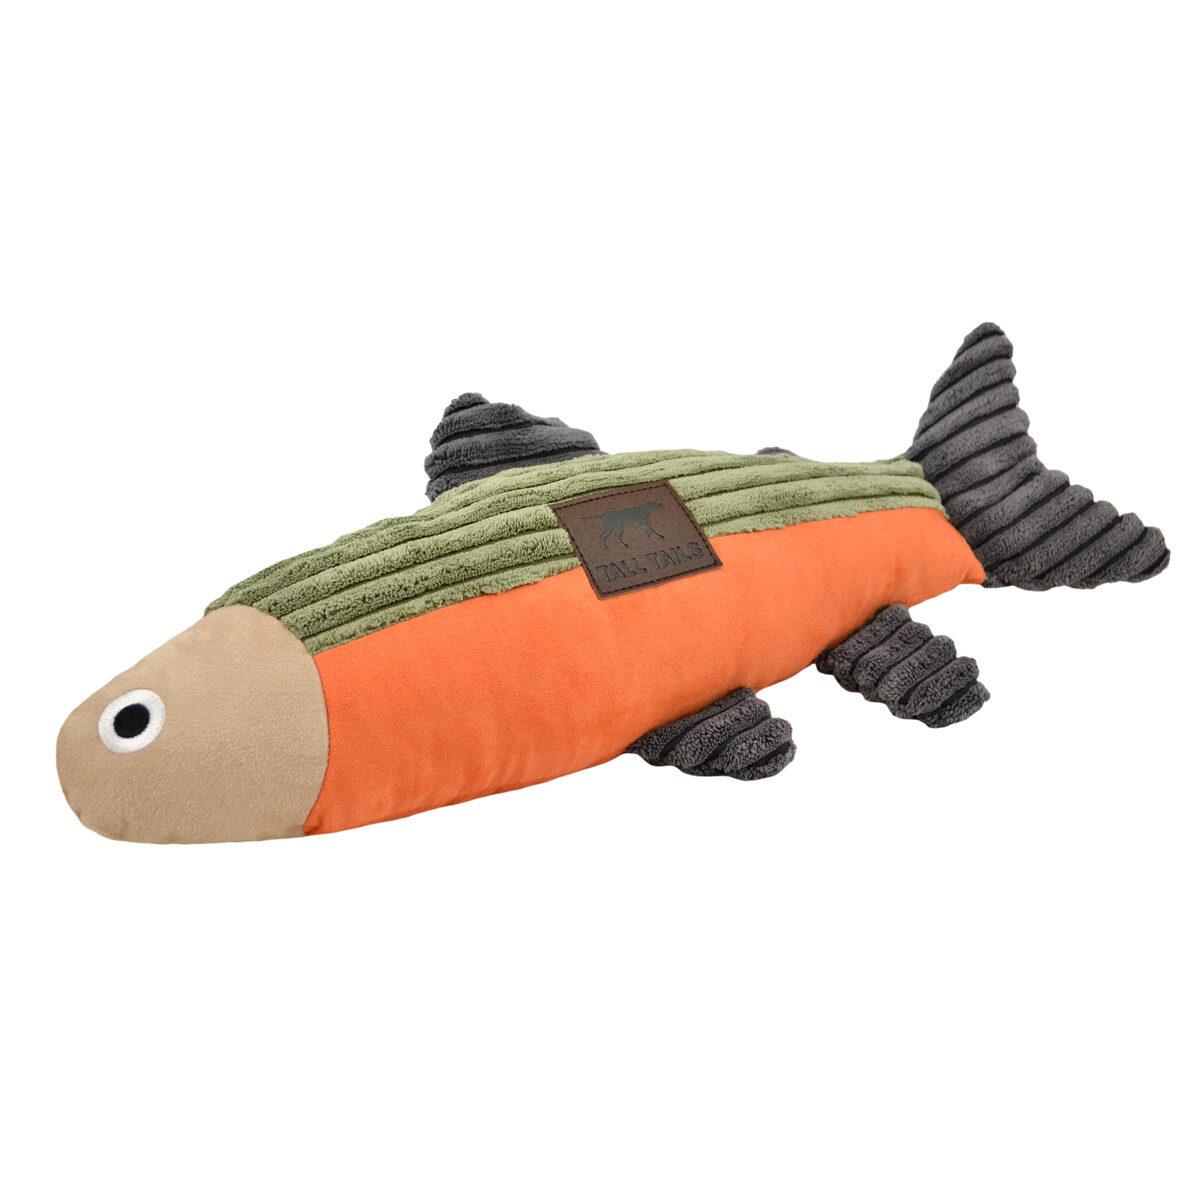 Tall Tails Plush Fish Dog Toy